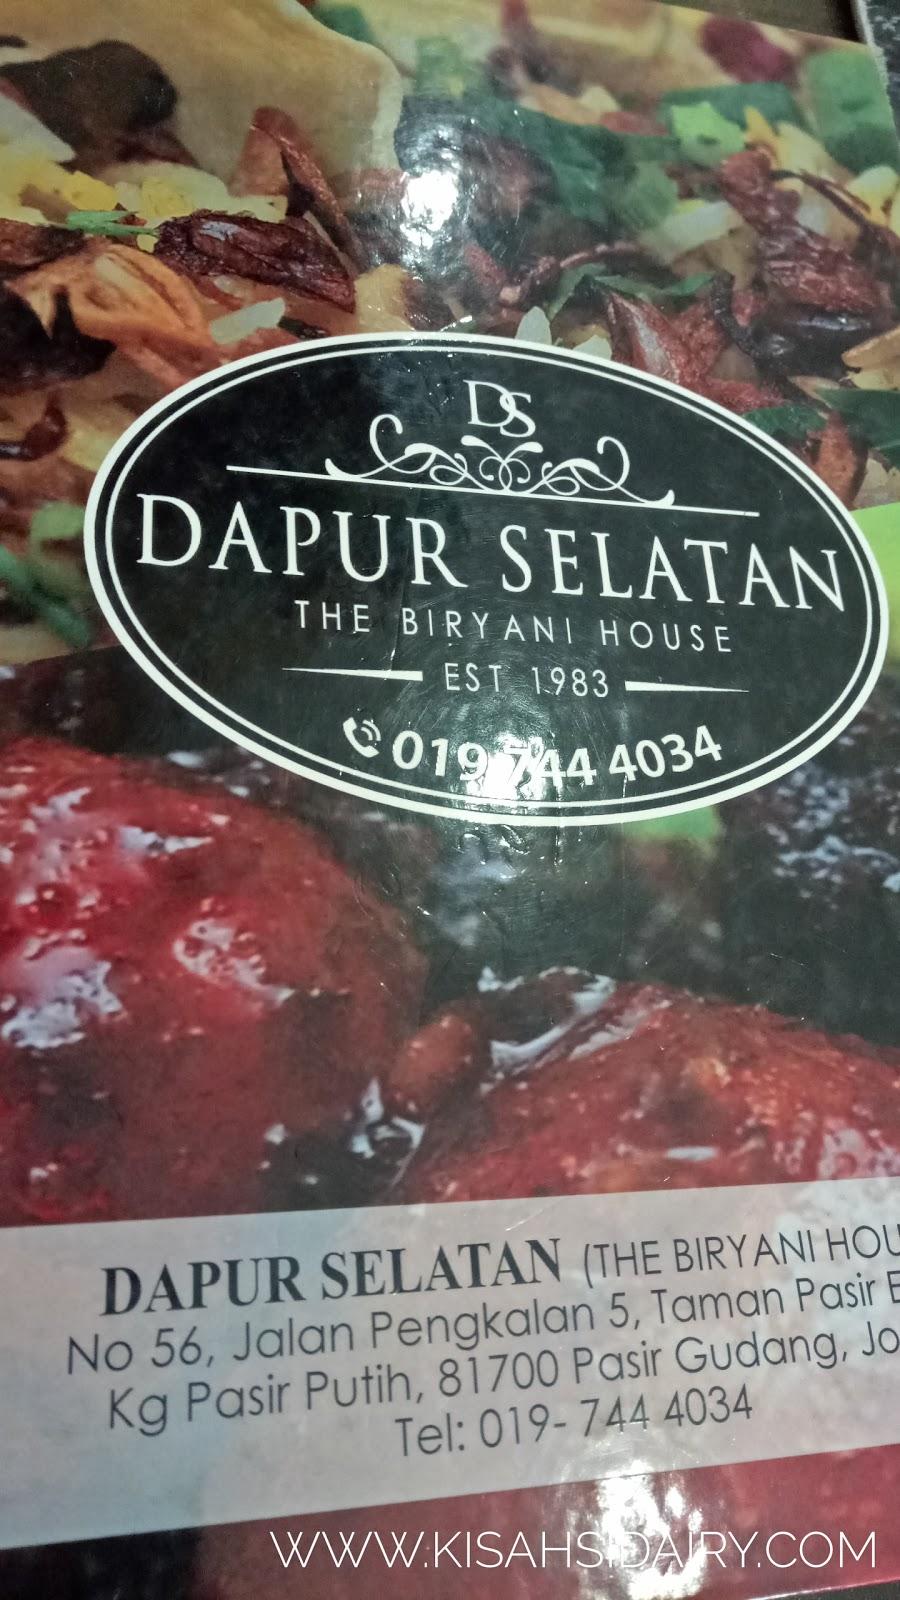 Lunch Di Dapur Selatan The Beryani House Pasir Gudang Kisahsidairy